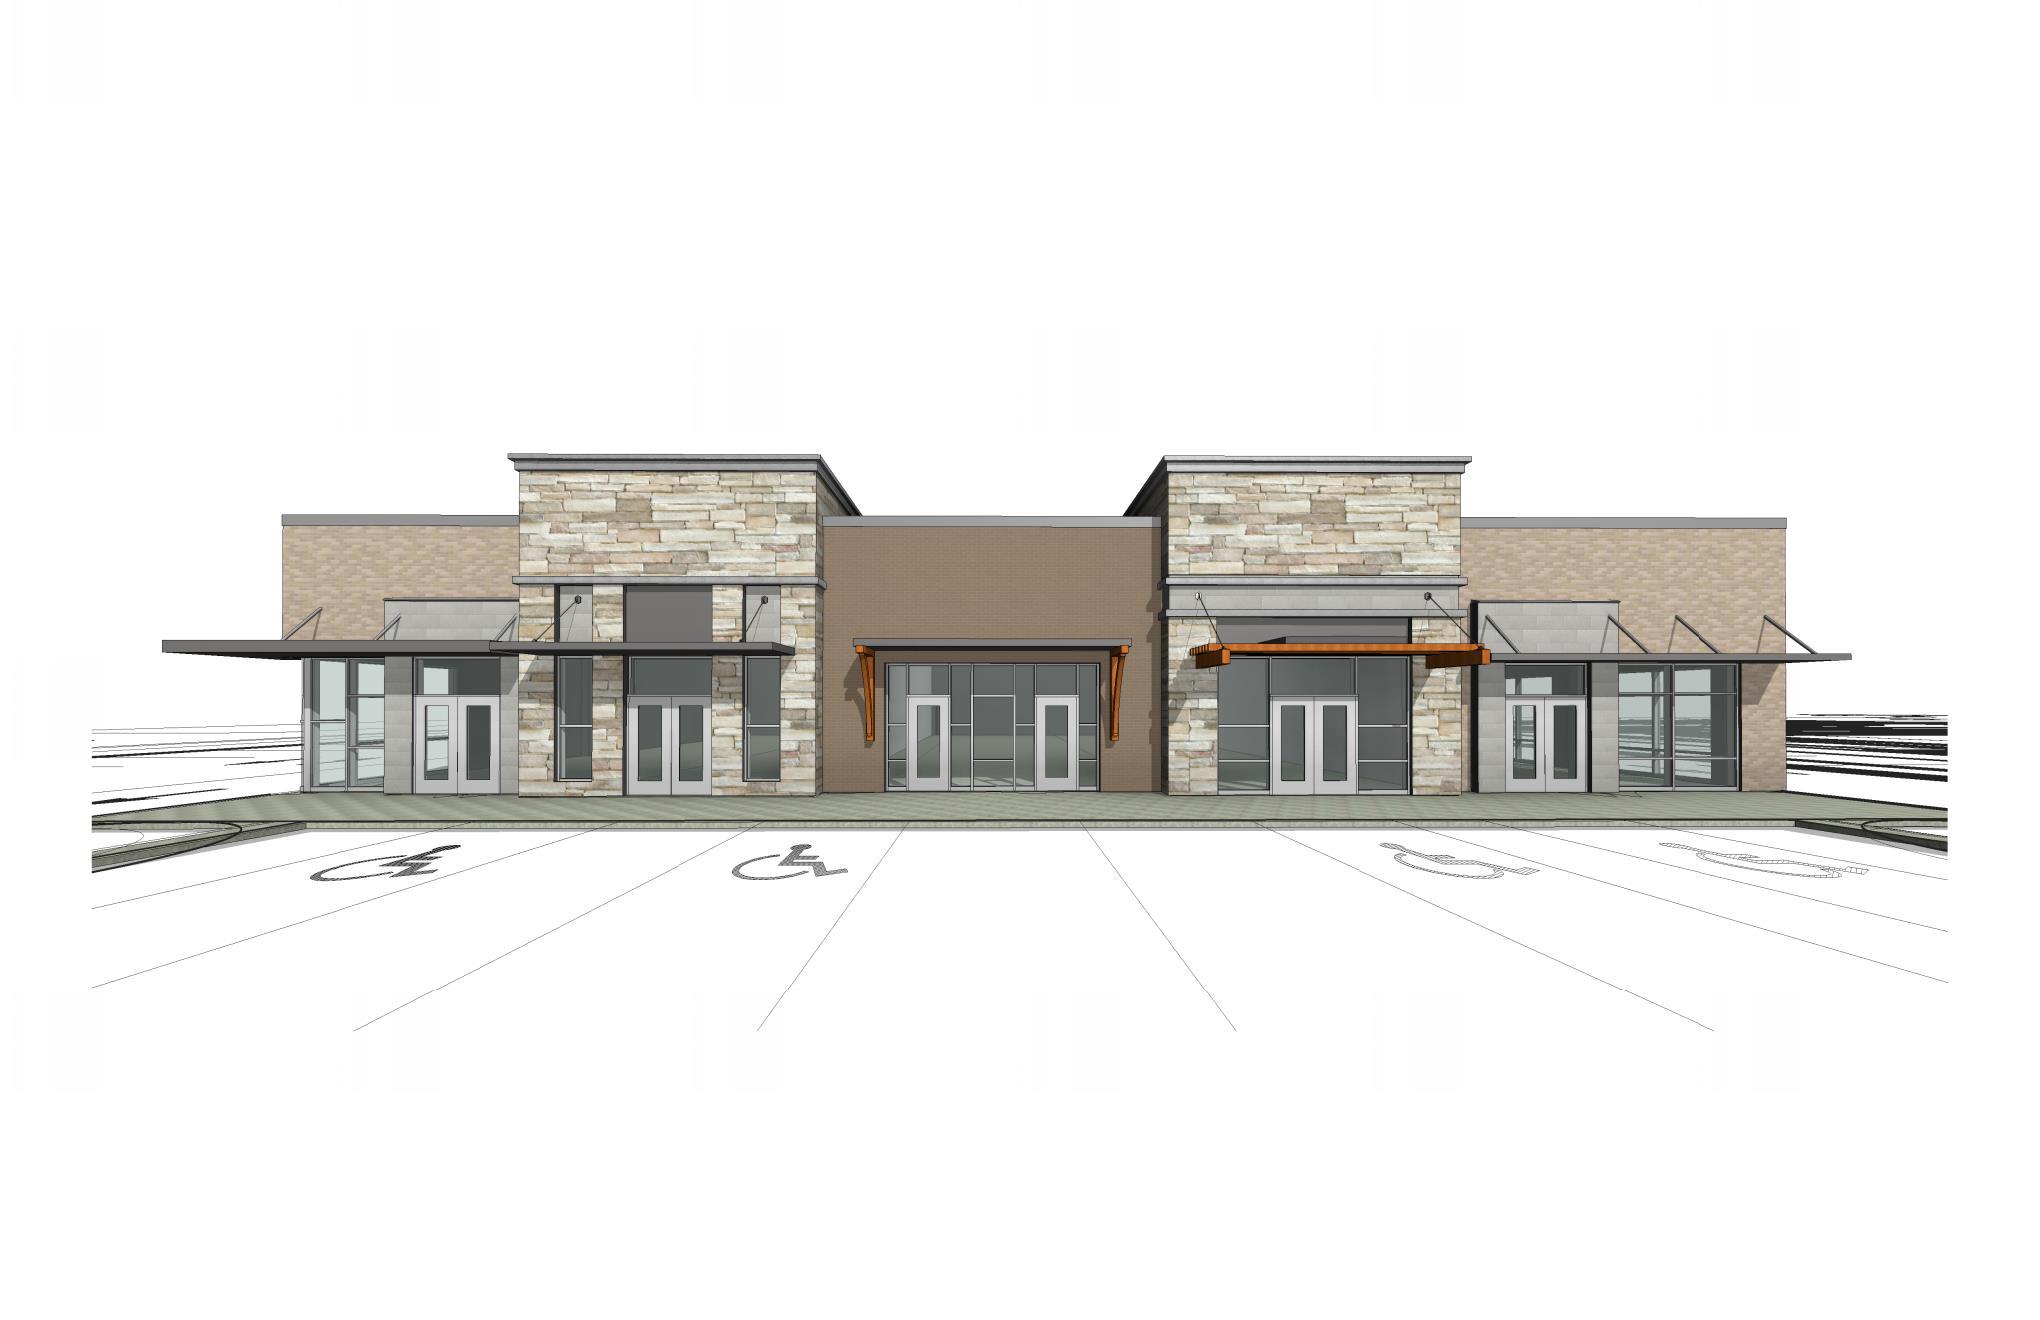 New Gull Road Retail Center Rendering